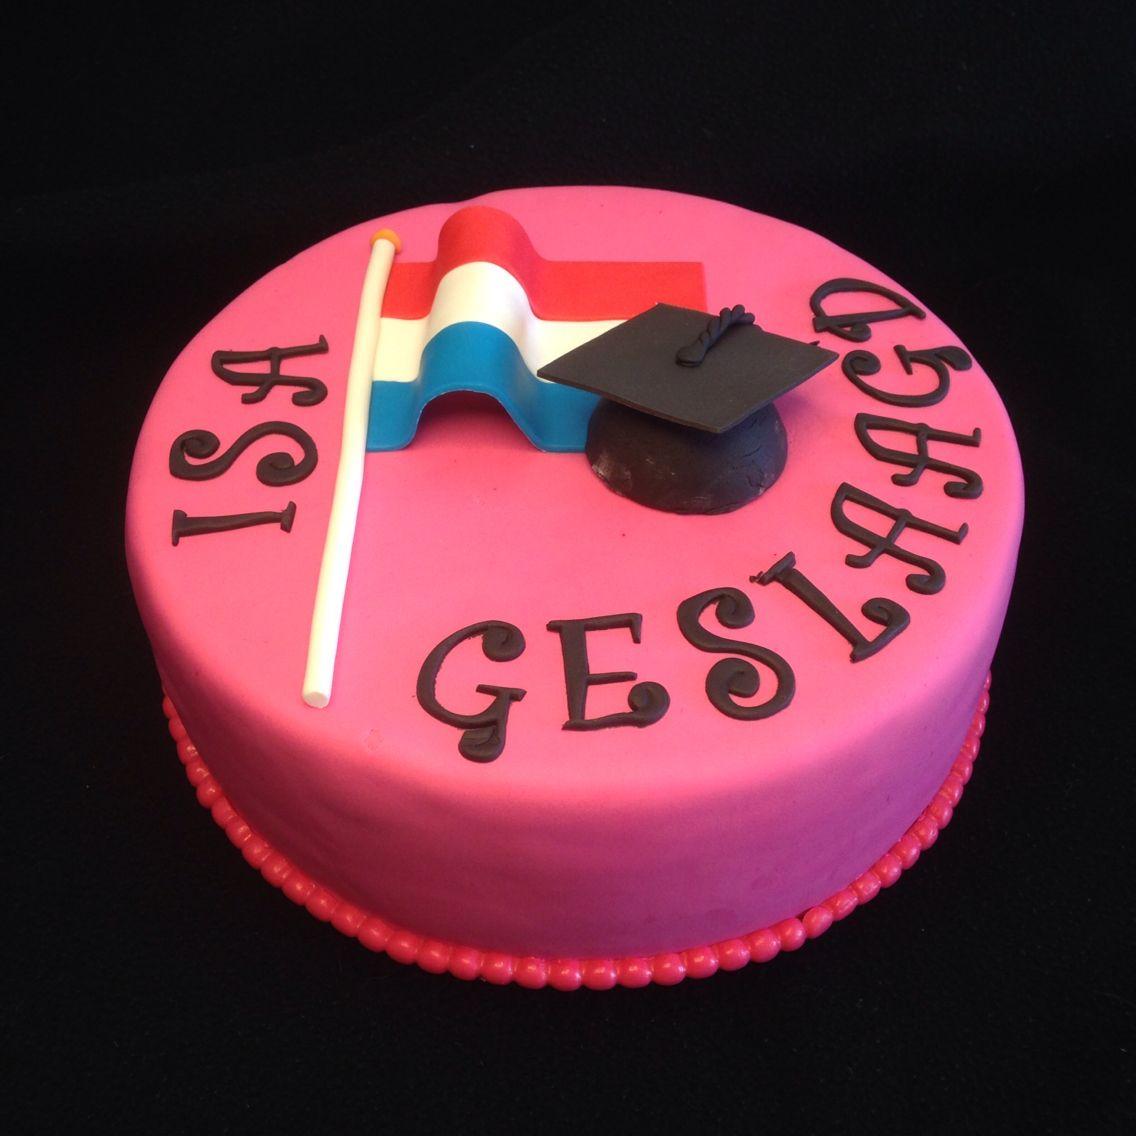 taart geslaagd Geslaagd taart | Geslaagd | Pinterest | Cake, Birthday cakes and Food taart geslaagd